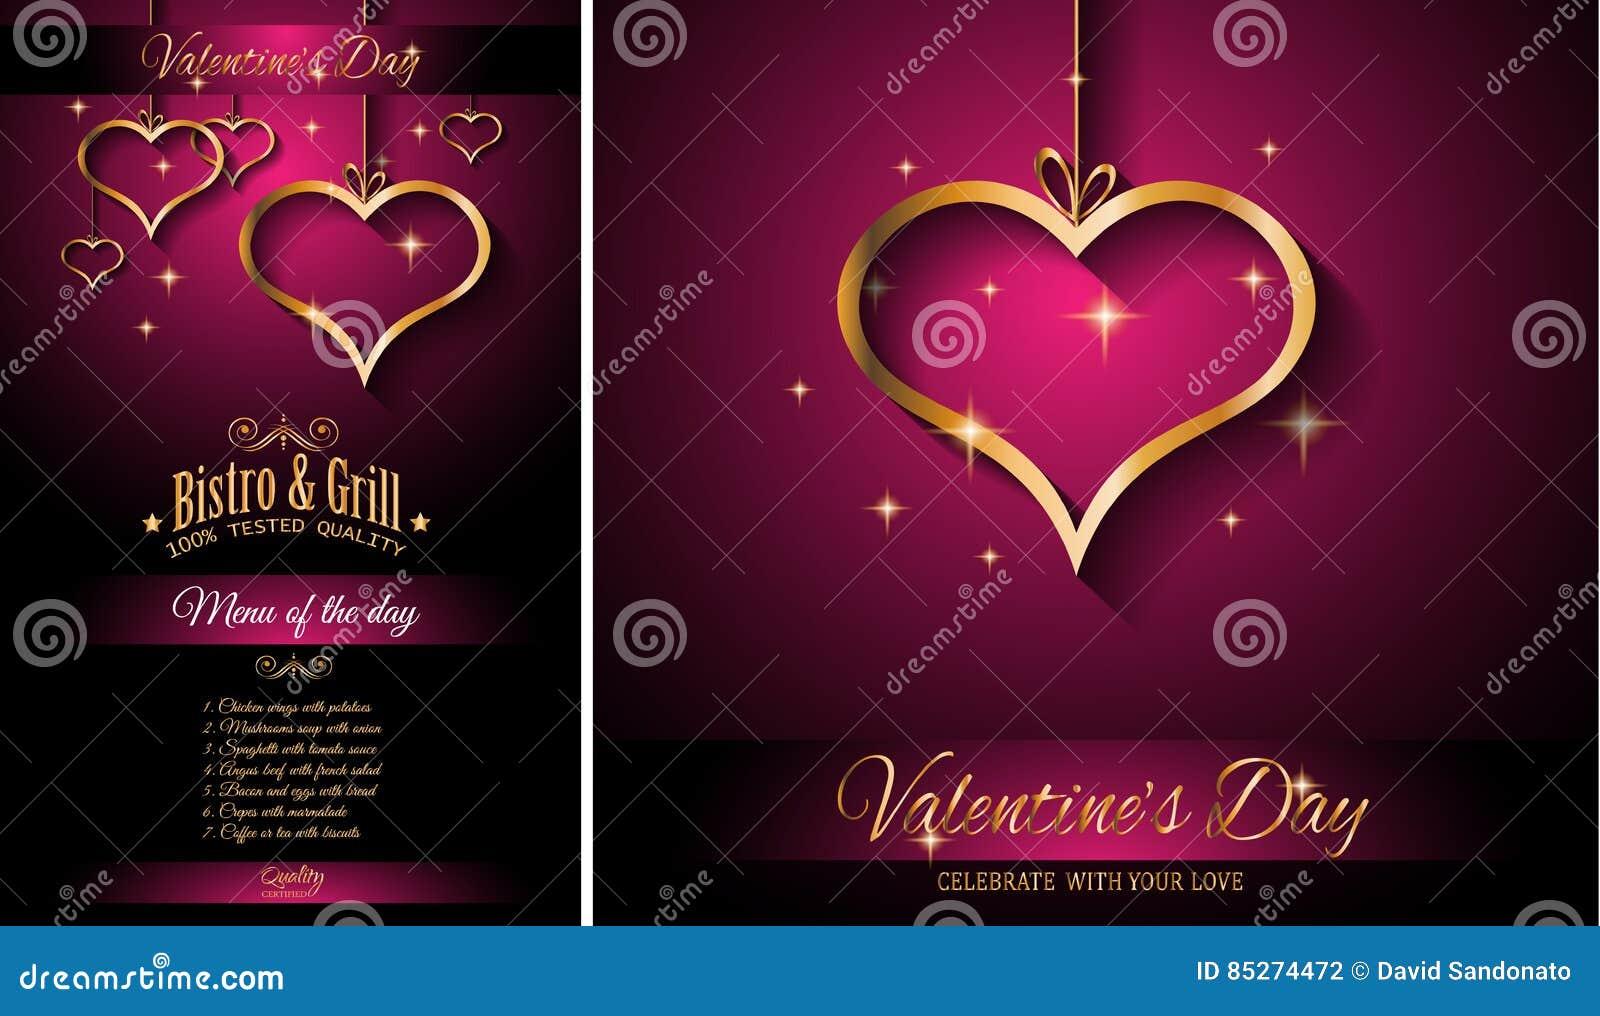 valentine s day restaurant menu template background for romantic